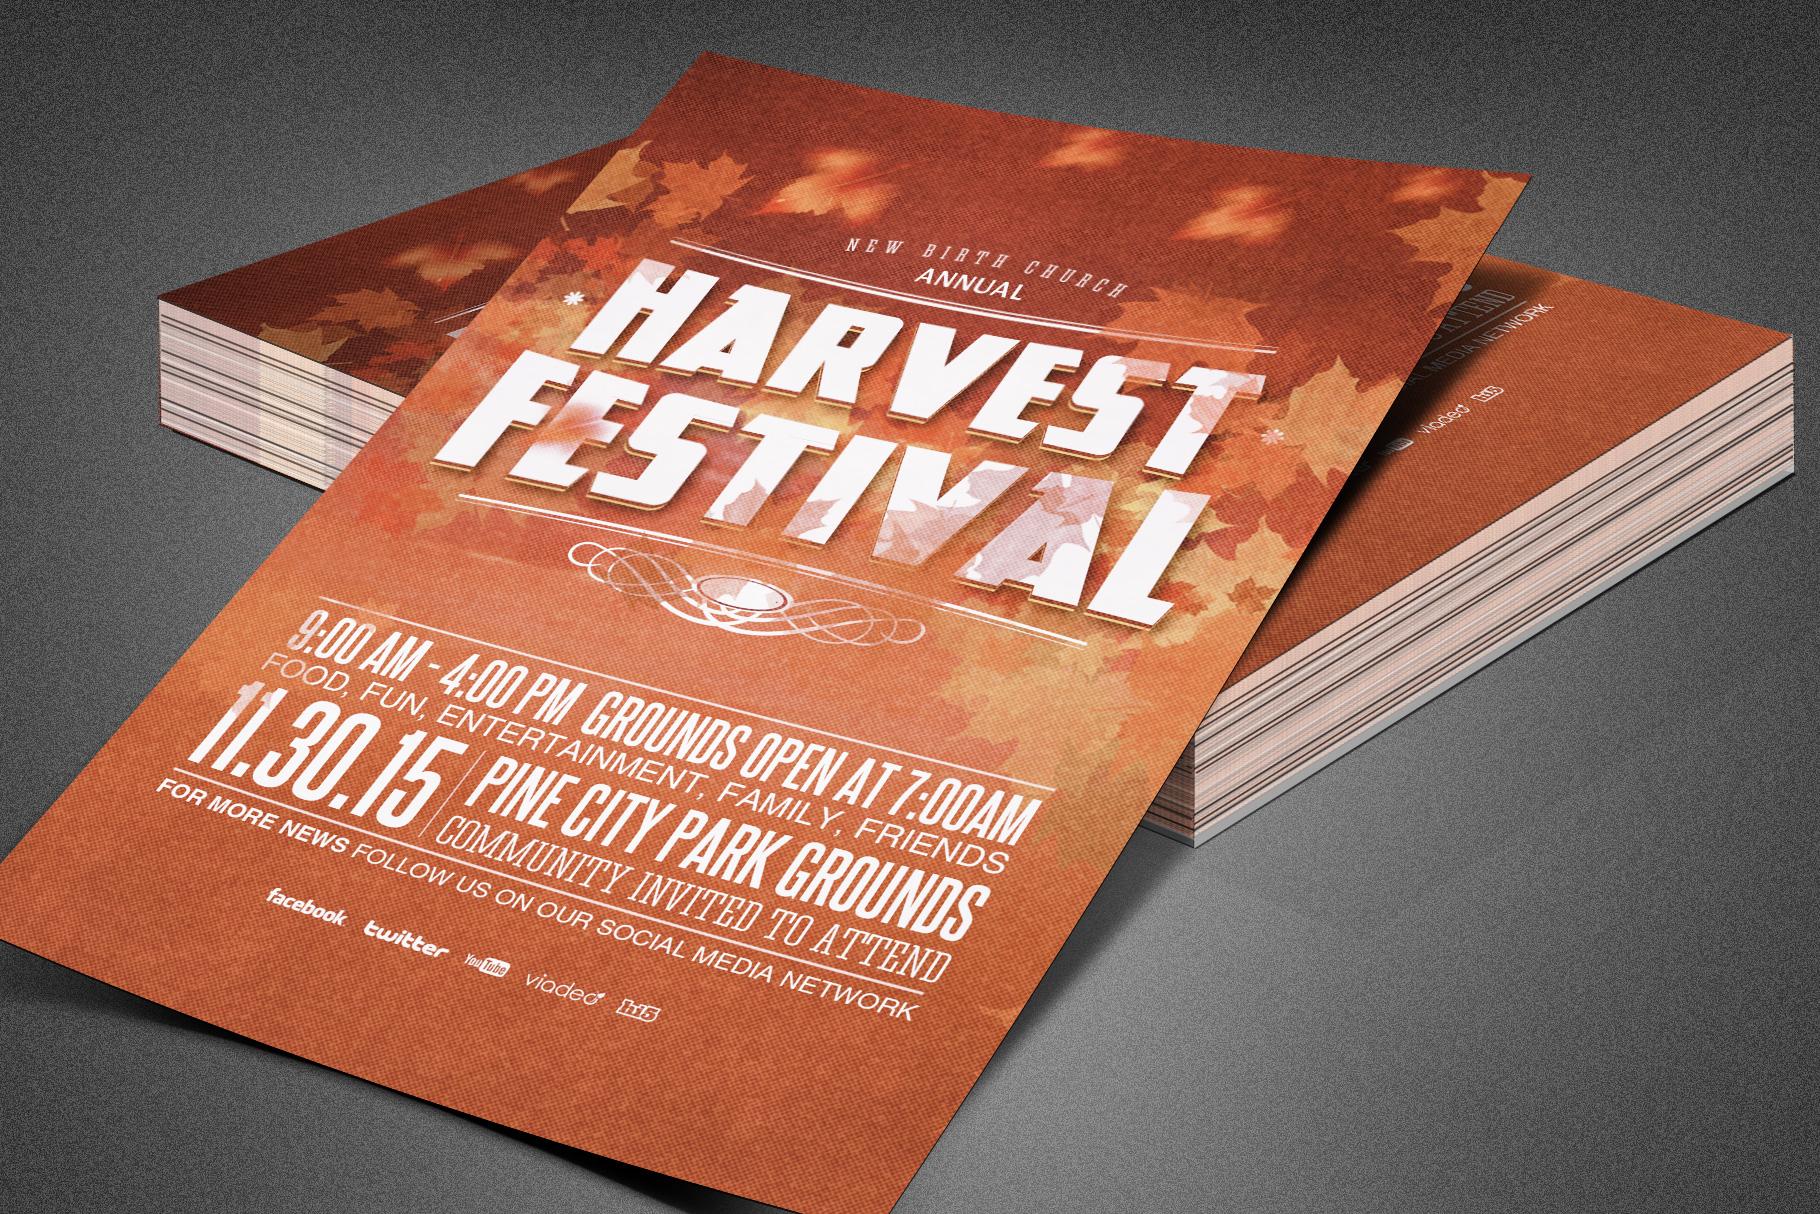 Harvest Festival Church Flyer example image 2